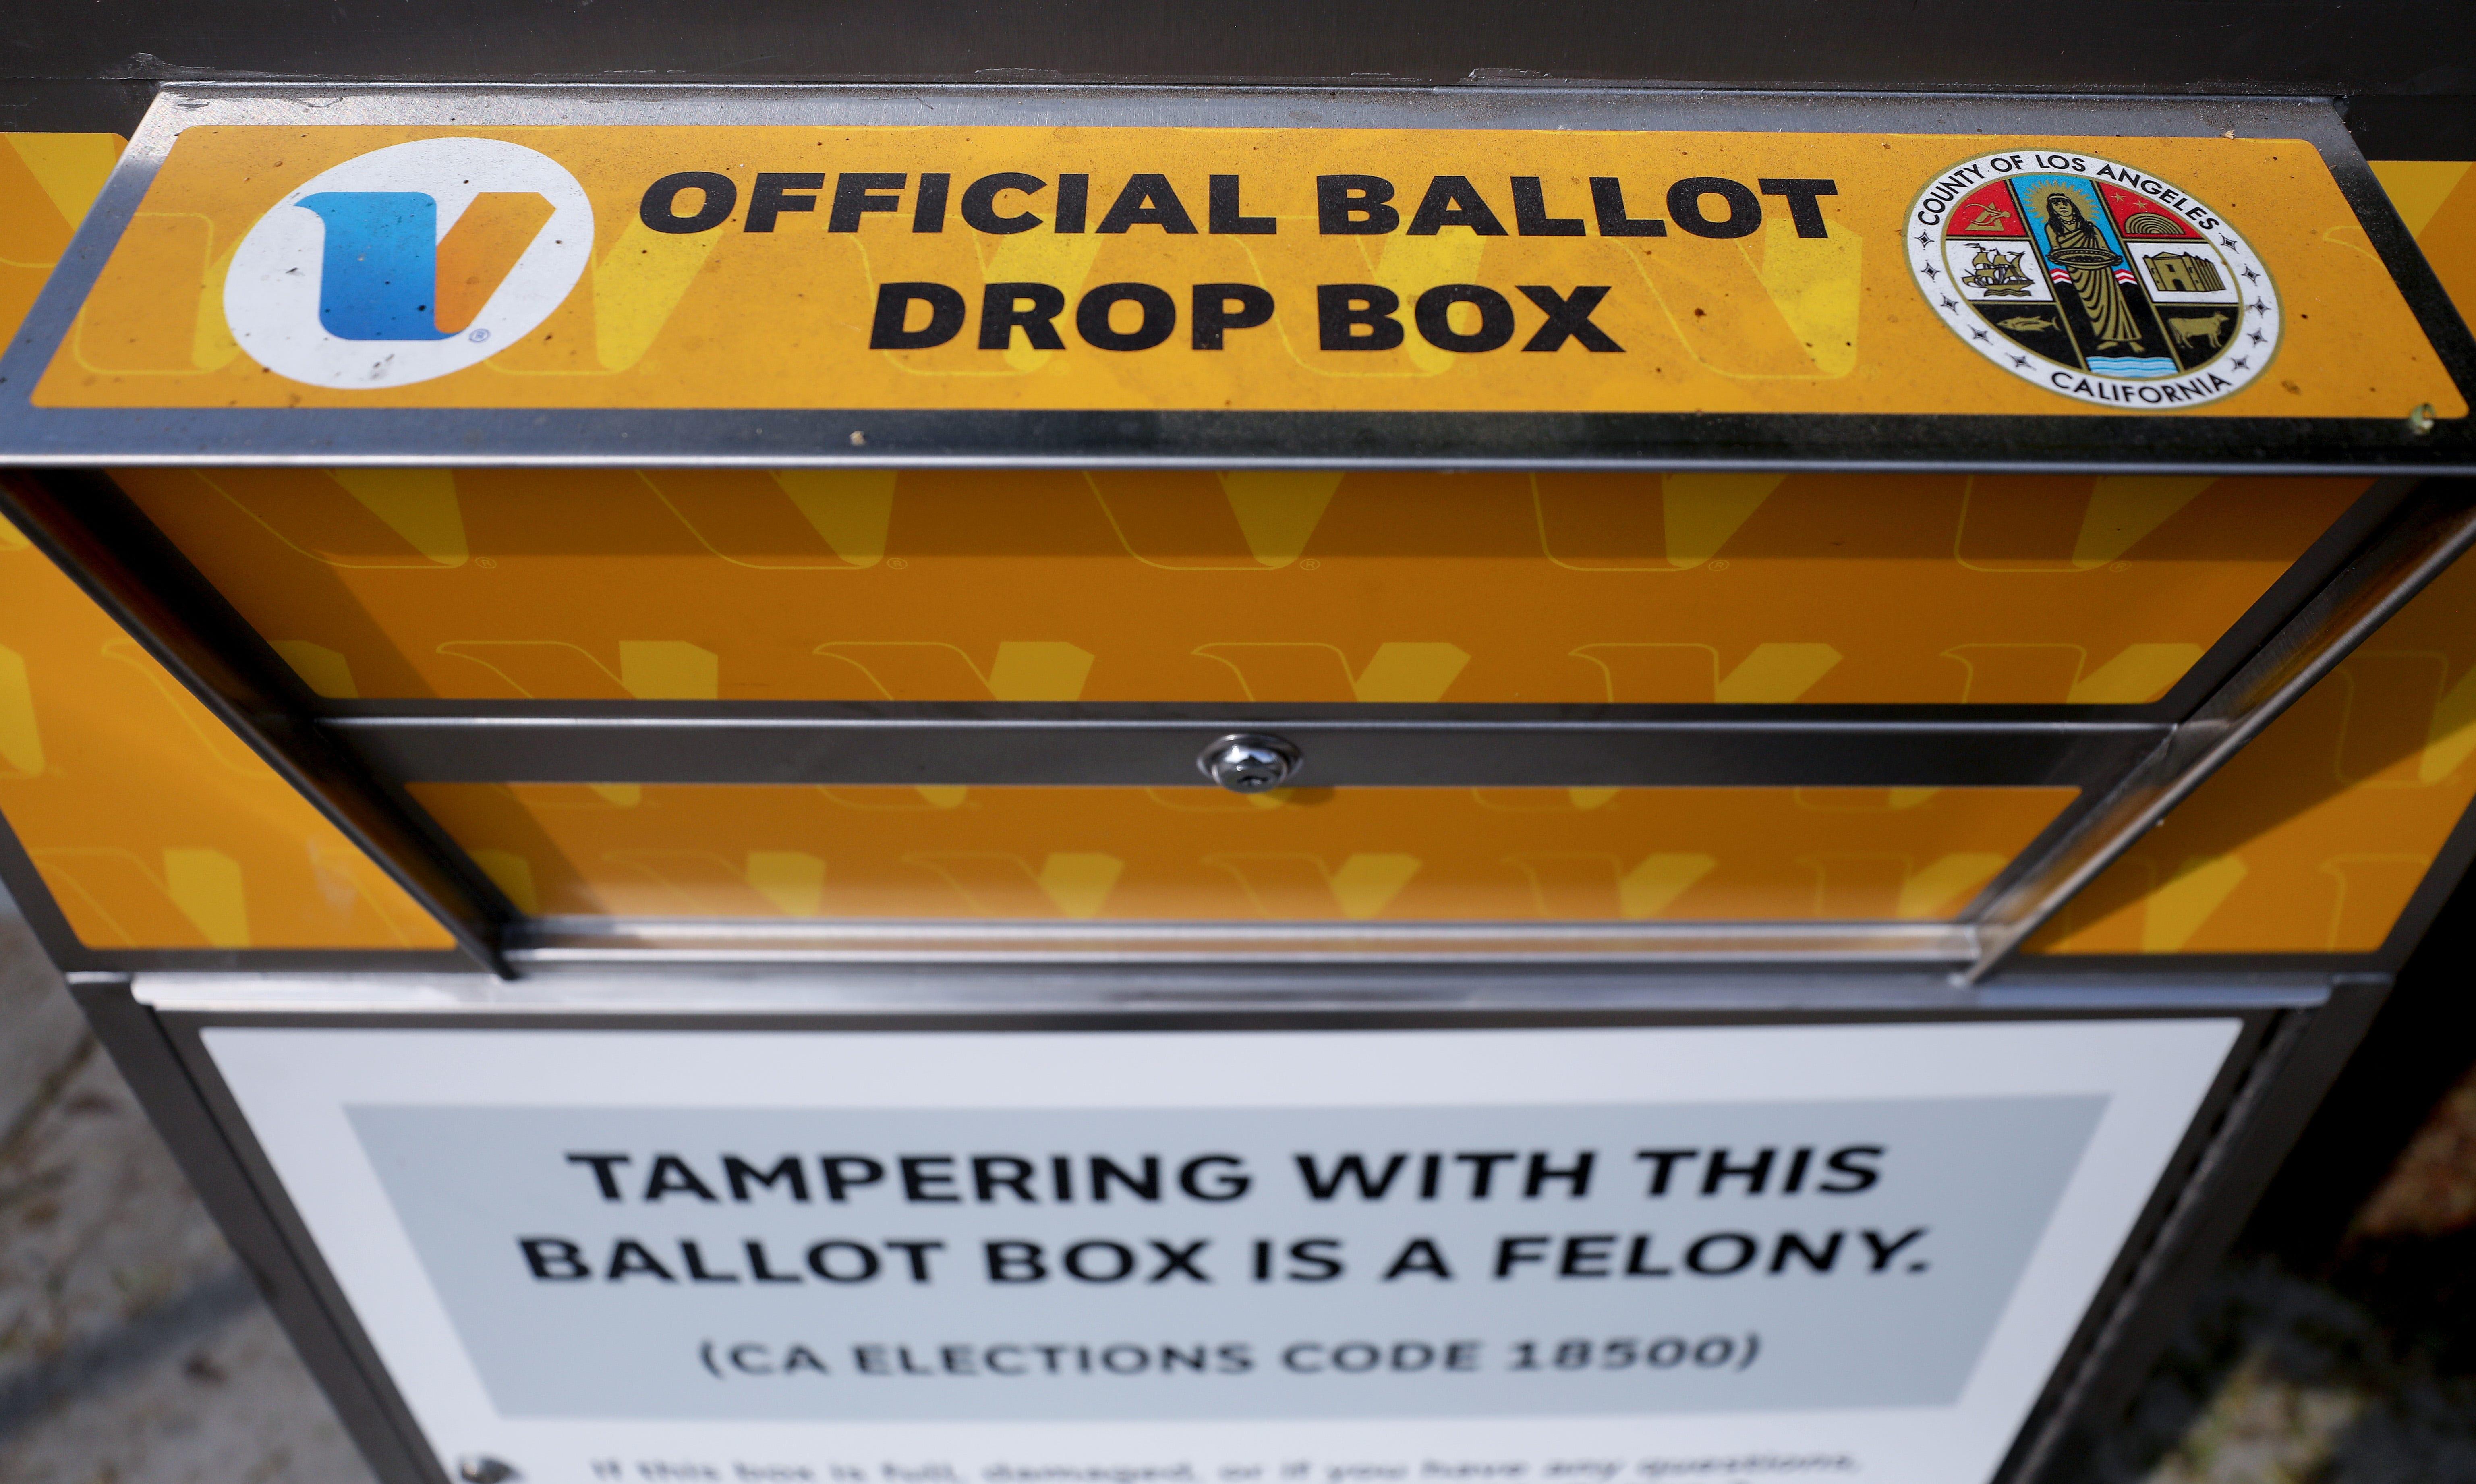 Ballot Drop Box Set On Fire In California 100 Ballots Damaged